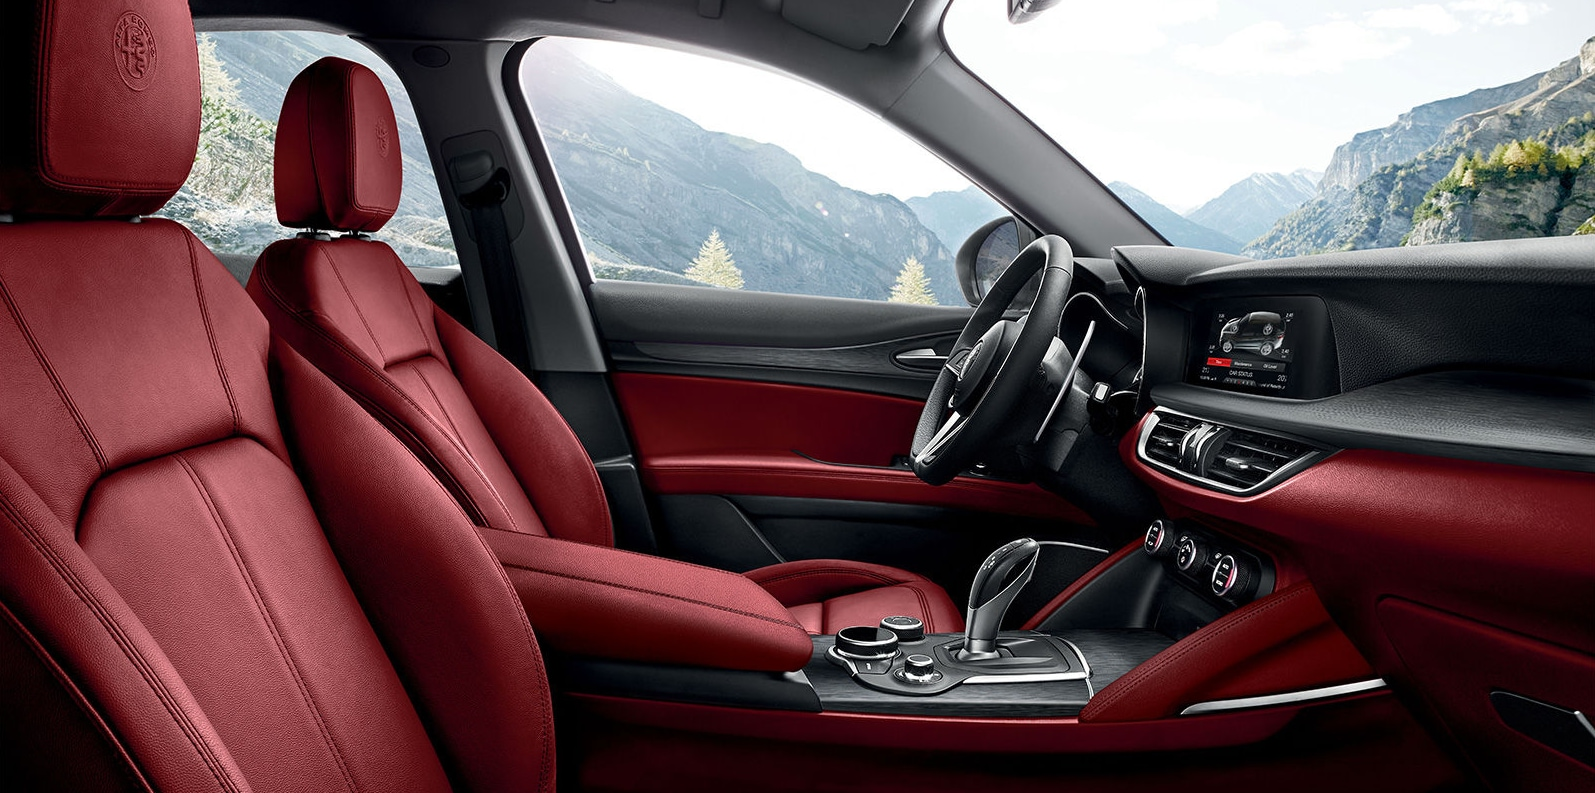 2018 Alfa Romeo Stelvio Price Trims Features And More Kelly